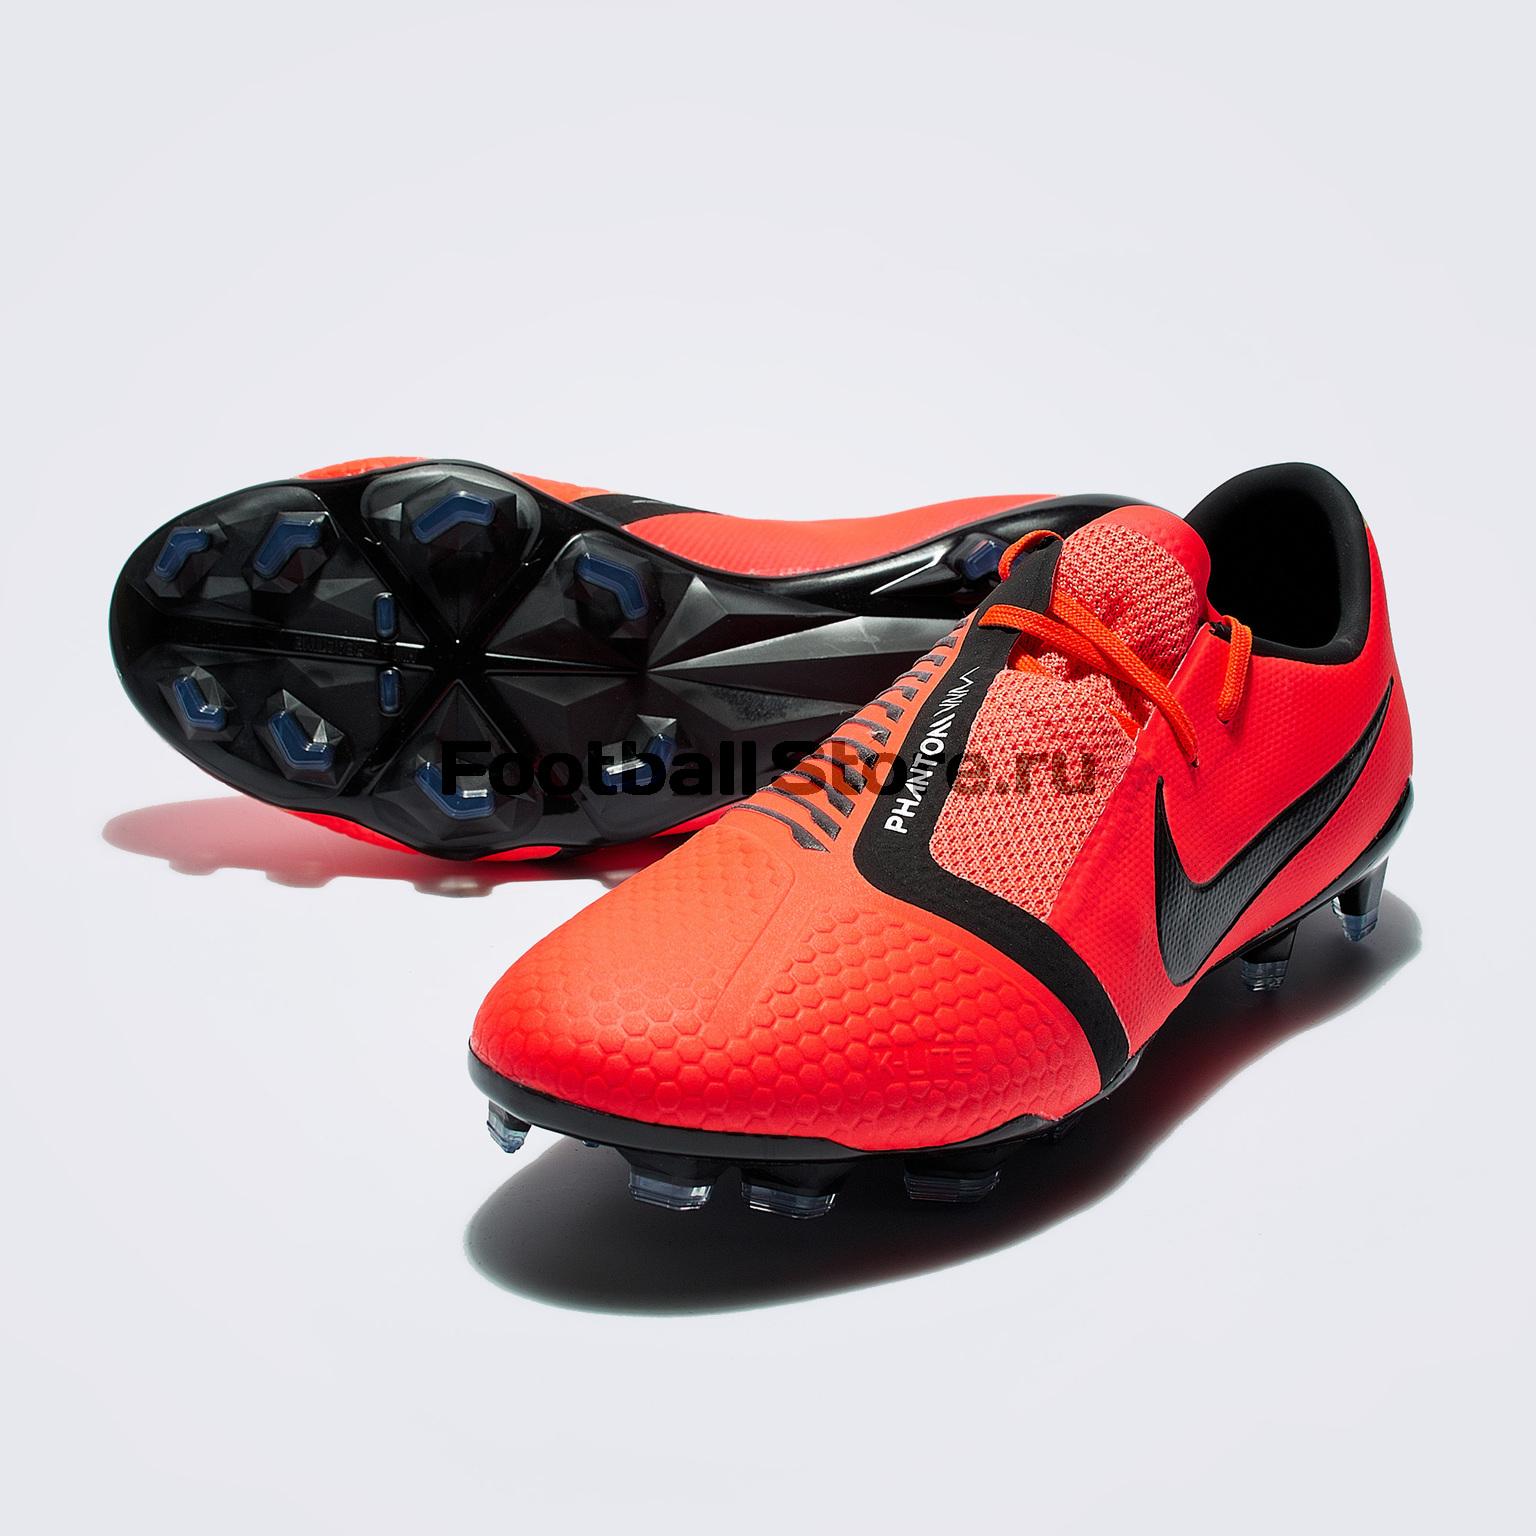 507f7b98 Бутсы Nike Phantom Venom Pro FG AO8738-600 – купить бутсы в интернет ...